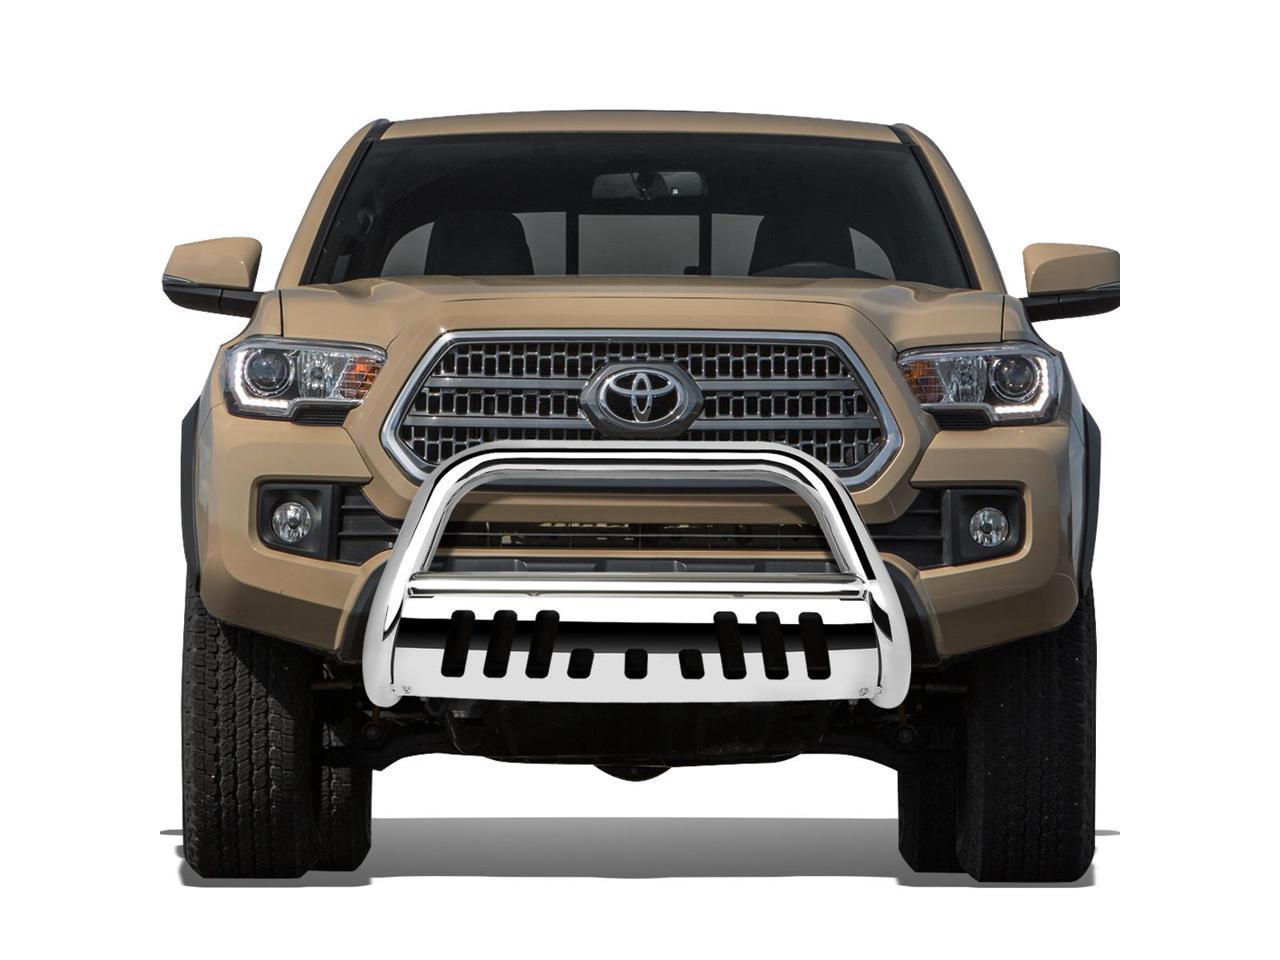 Relocation Kit Skid Plate For Tacoma 3rd Gen 3 Chrome Bumper Push Bull Bar